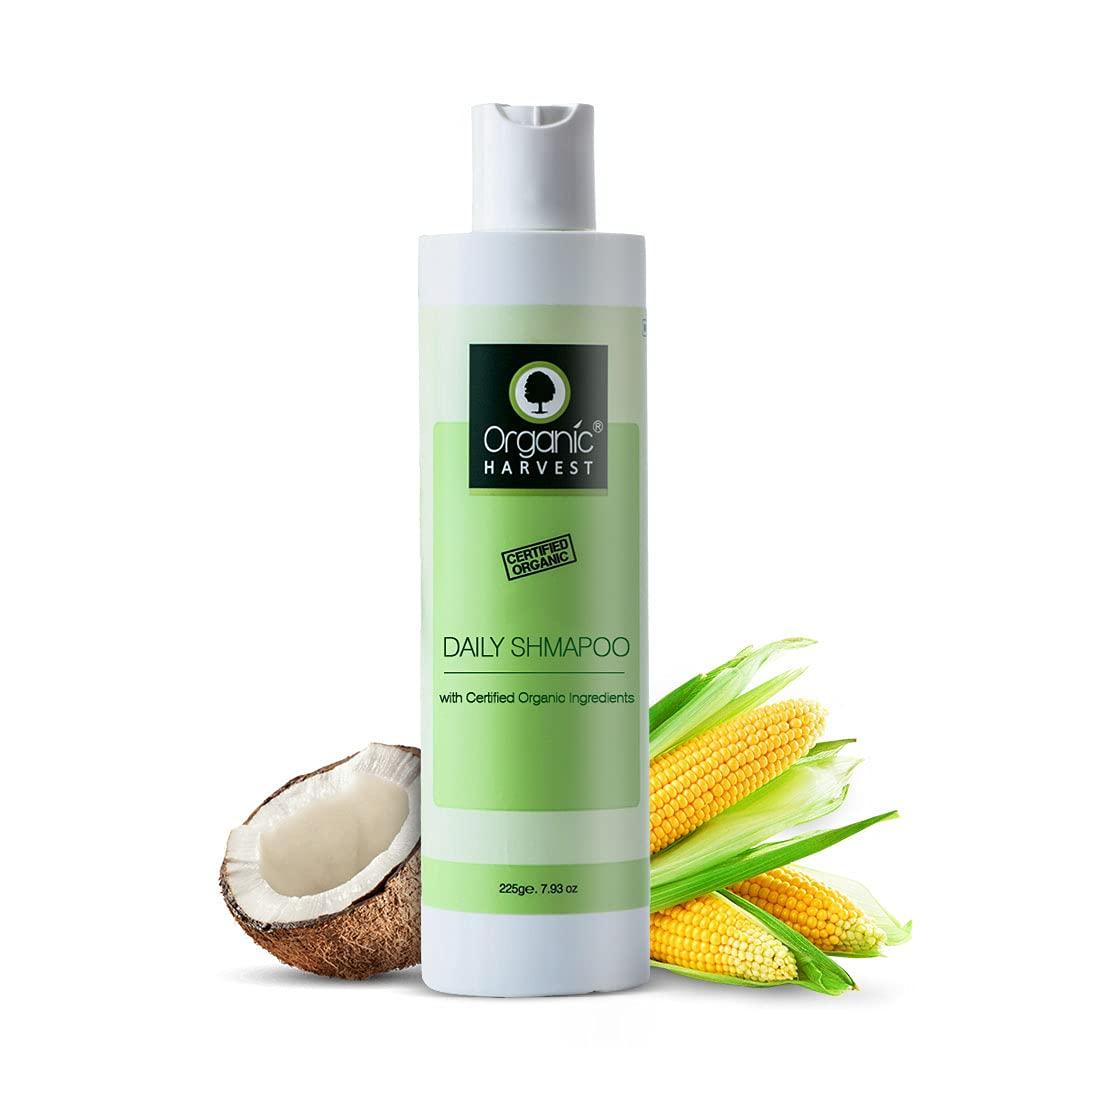 Organic Harvest | Daily Shampoo - 225ml